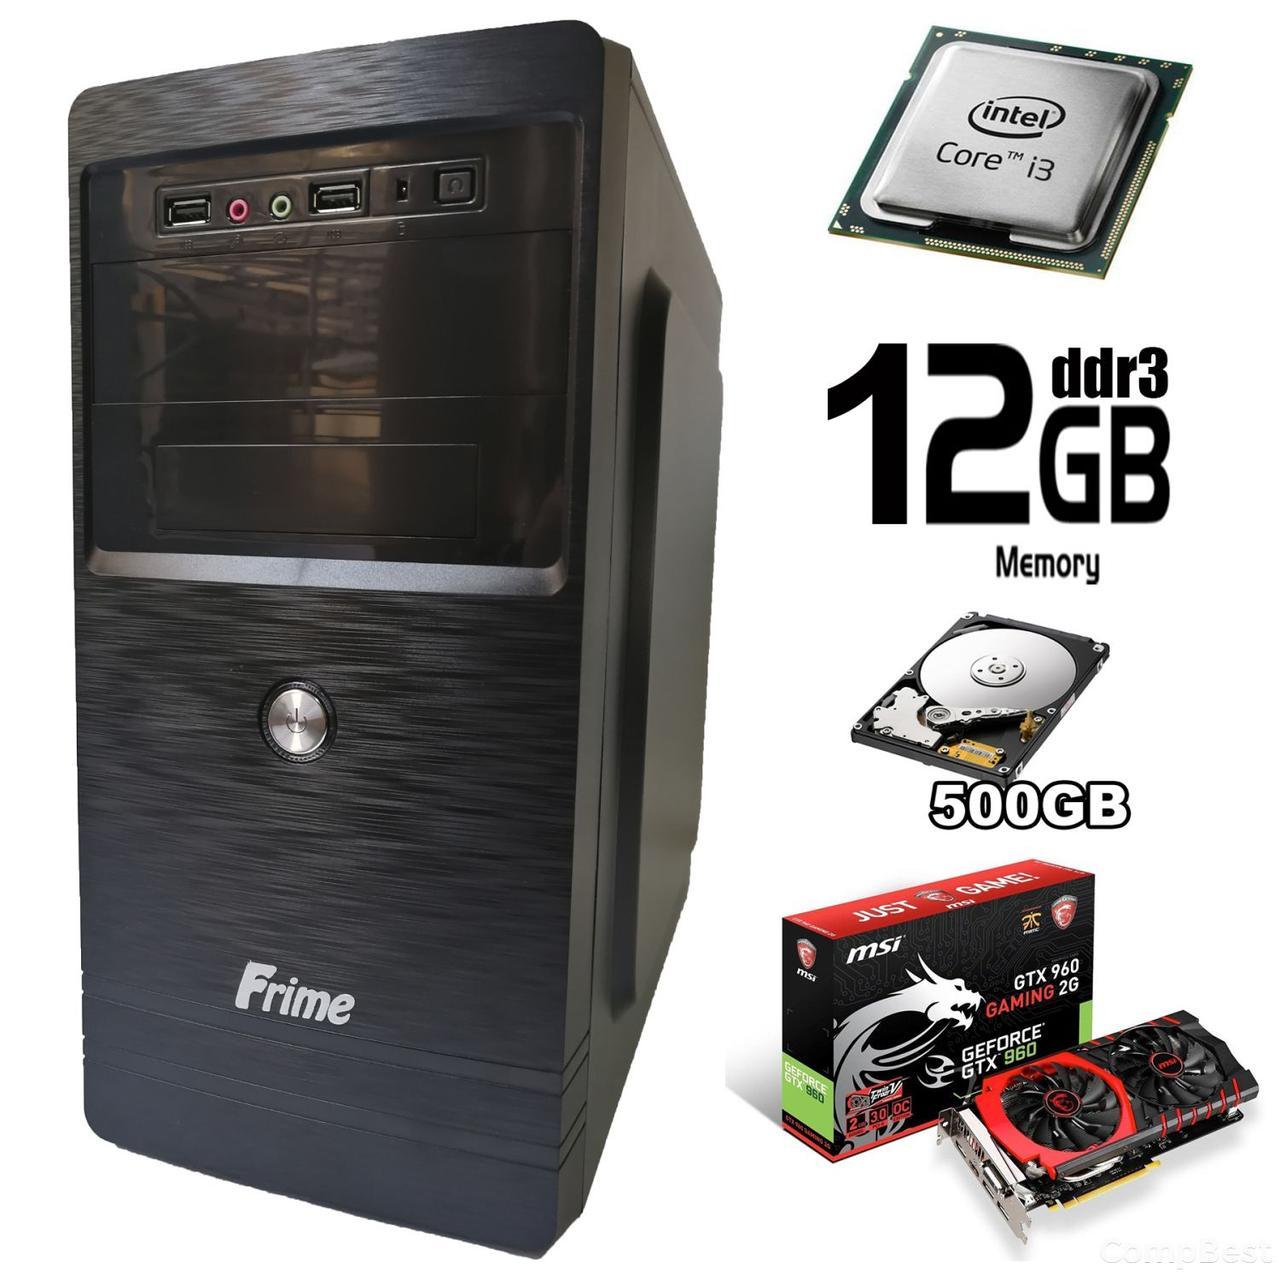 Frime Tower / Intel Core i3-4130 (2(4) ядра по 3.4GHz) / 12 GB DDR3 / 500 GB HDD / nVidia GeForce GTX 960 2GB GDDR5 128bit (HDMI, DVI, DP) / new БП